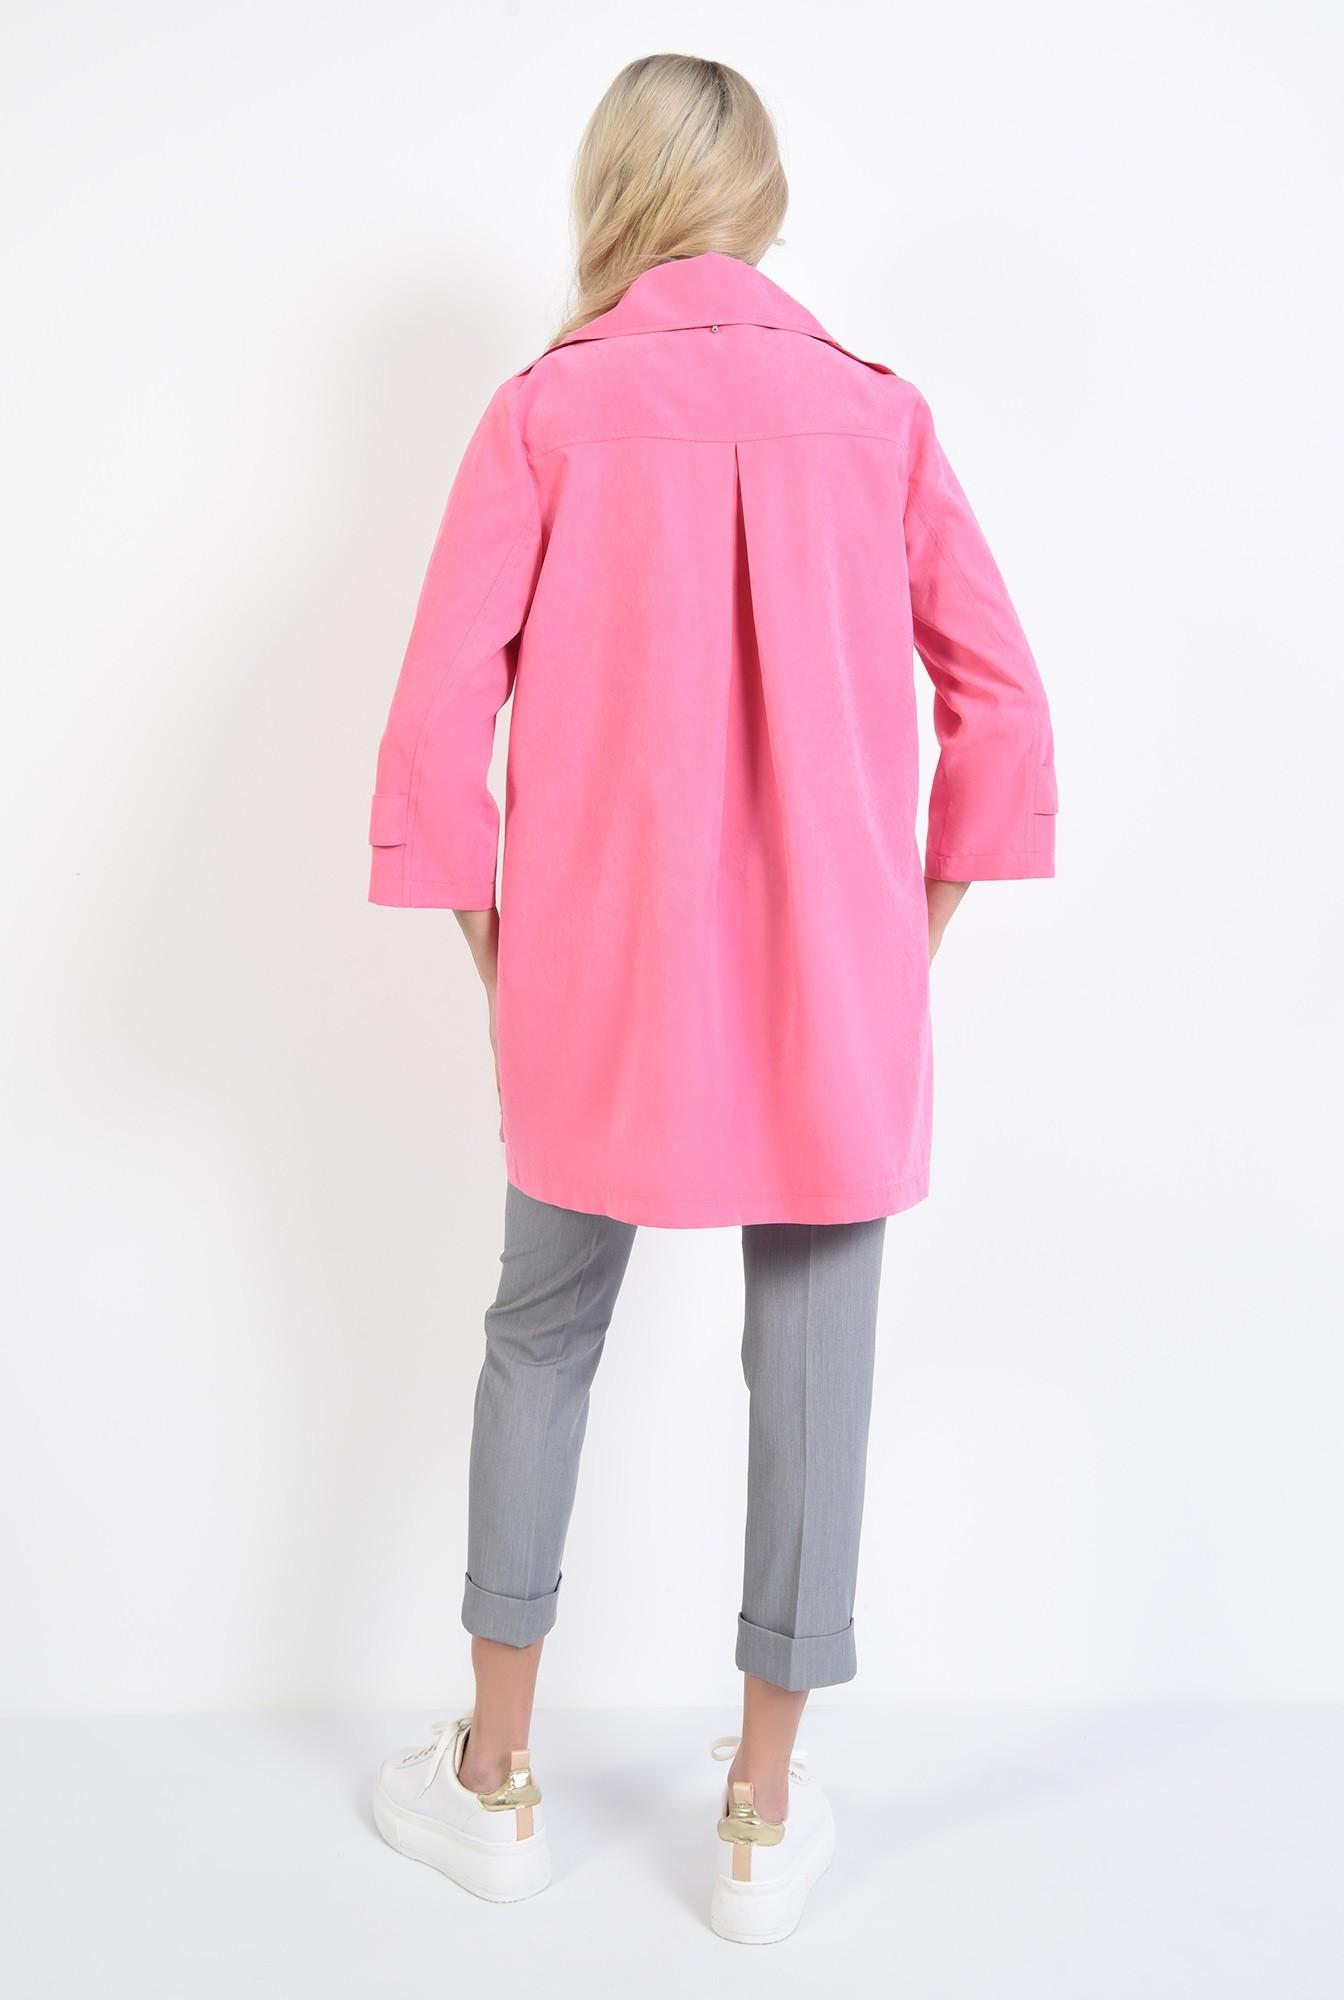 1 - jacheta roz, cu nasturi, cu revere, croi relaxat